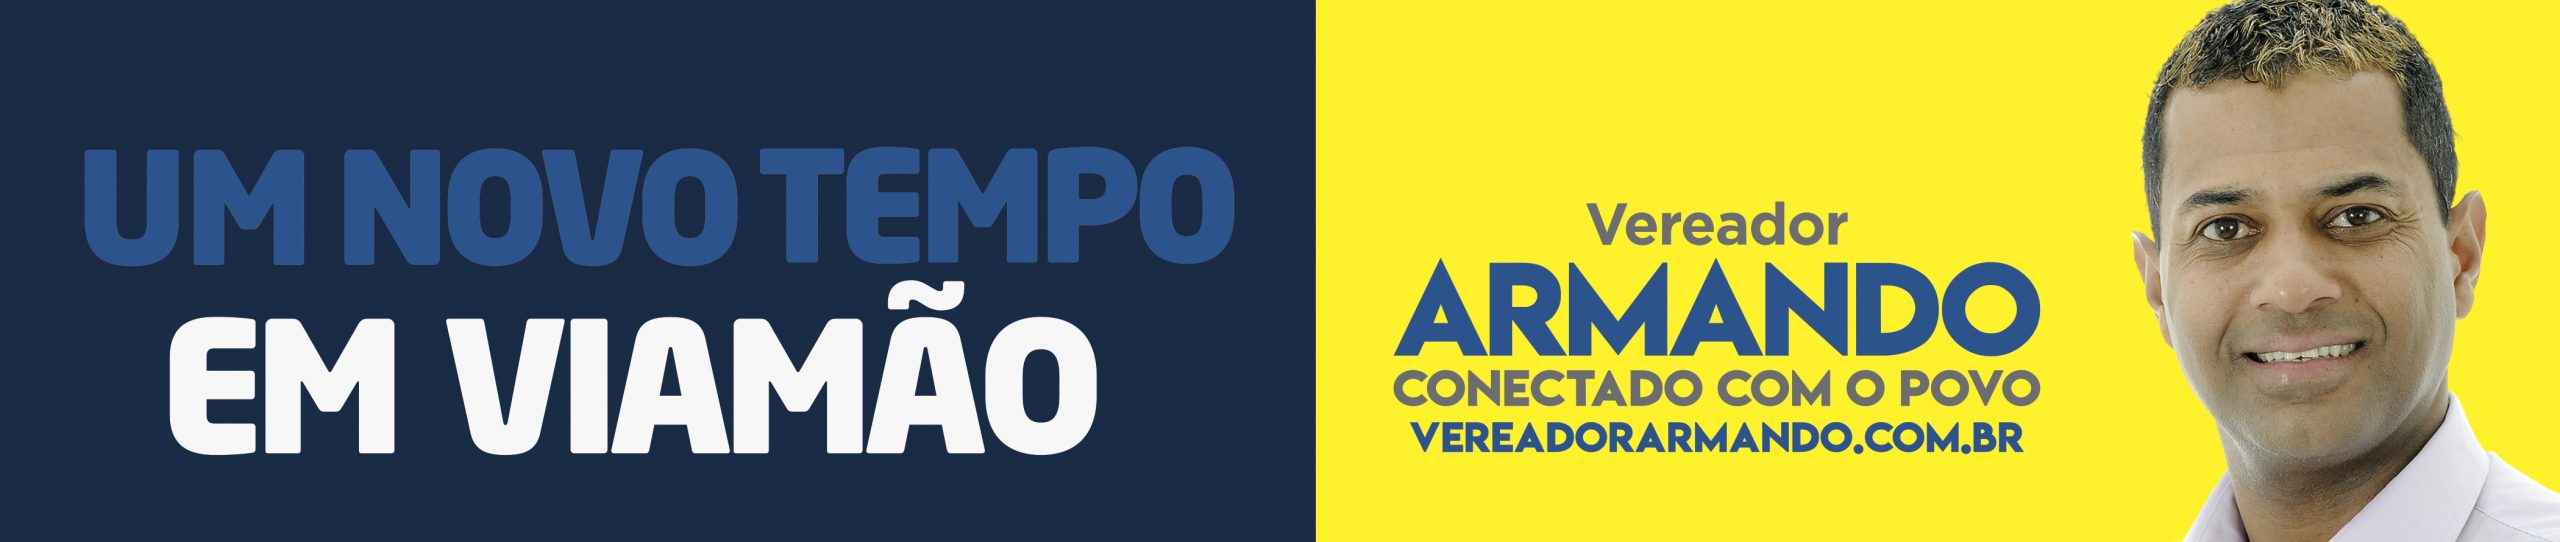 Vereador Armando